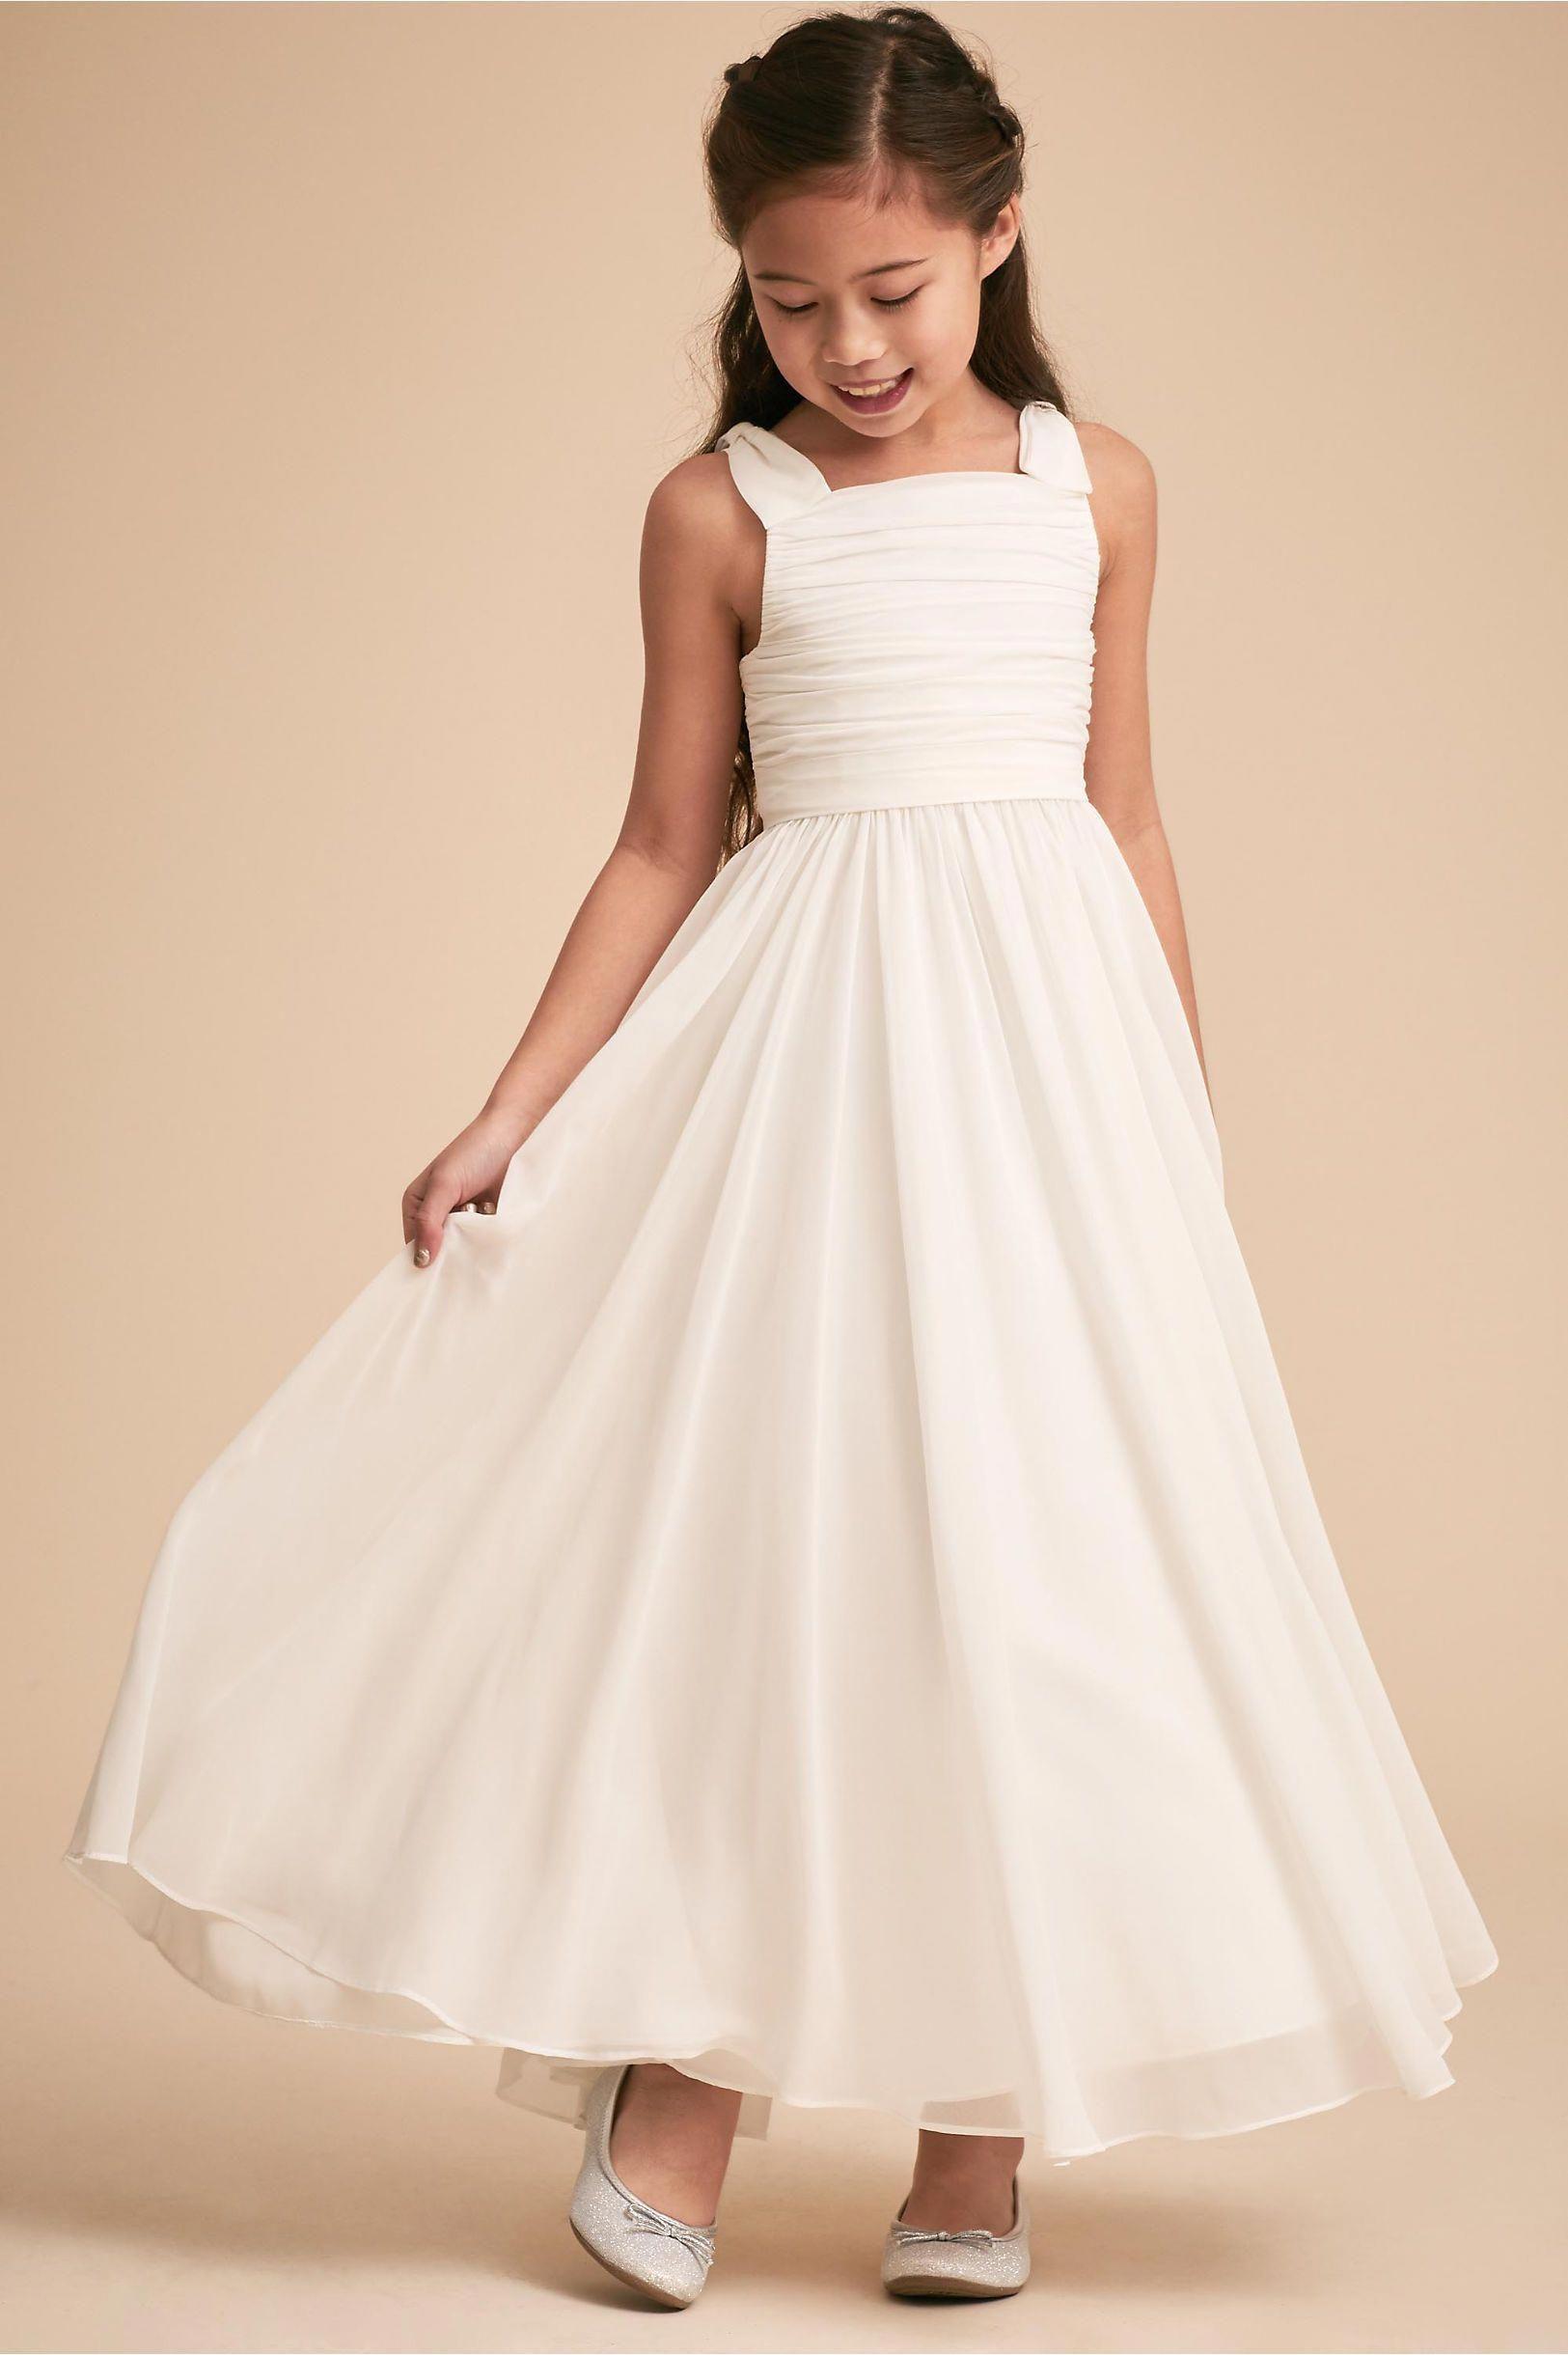 63b28a0b687 BHLDN s Miriam Dress in Ivory  italianweddingdress